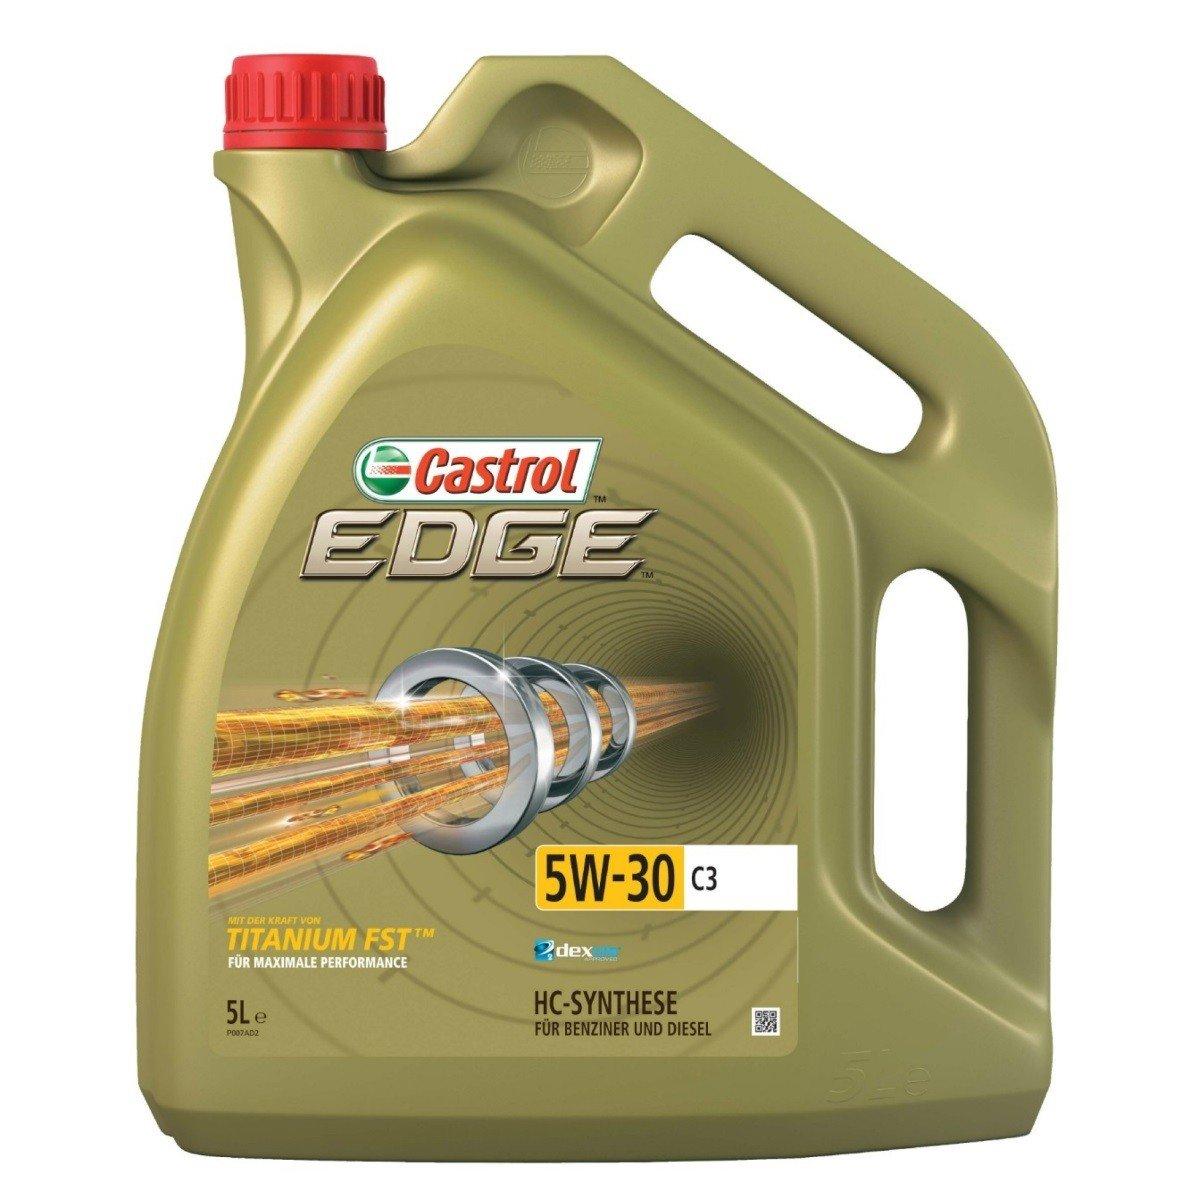 Plně syntetický motorový olej CASTROL Edge 5W30 C3 Titanium FST 5L